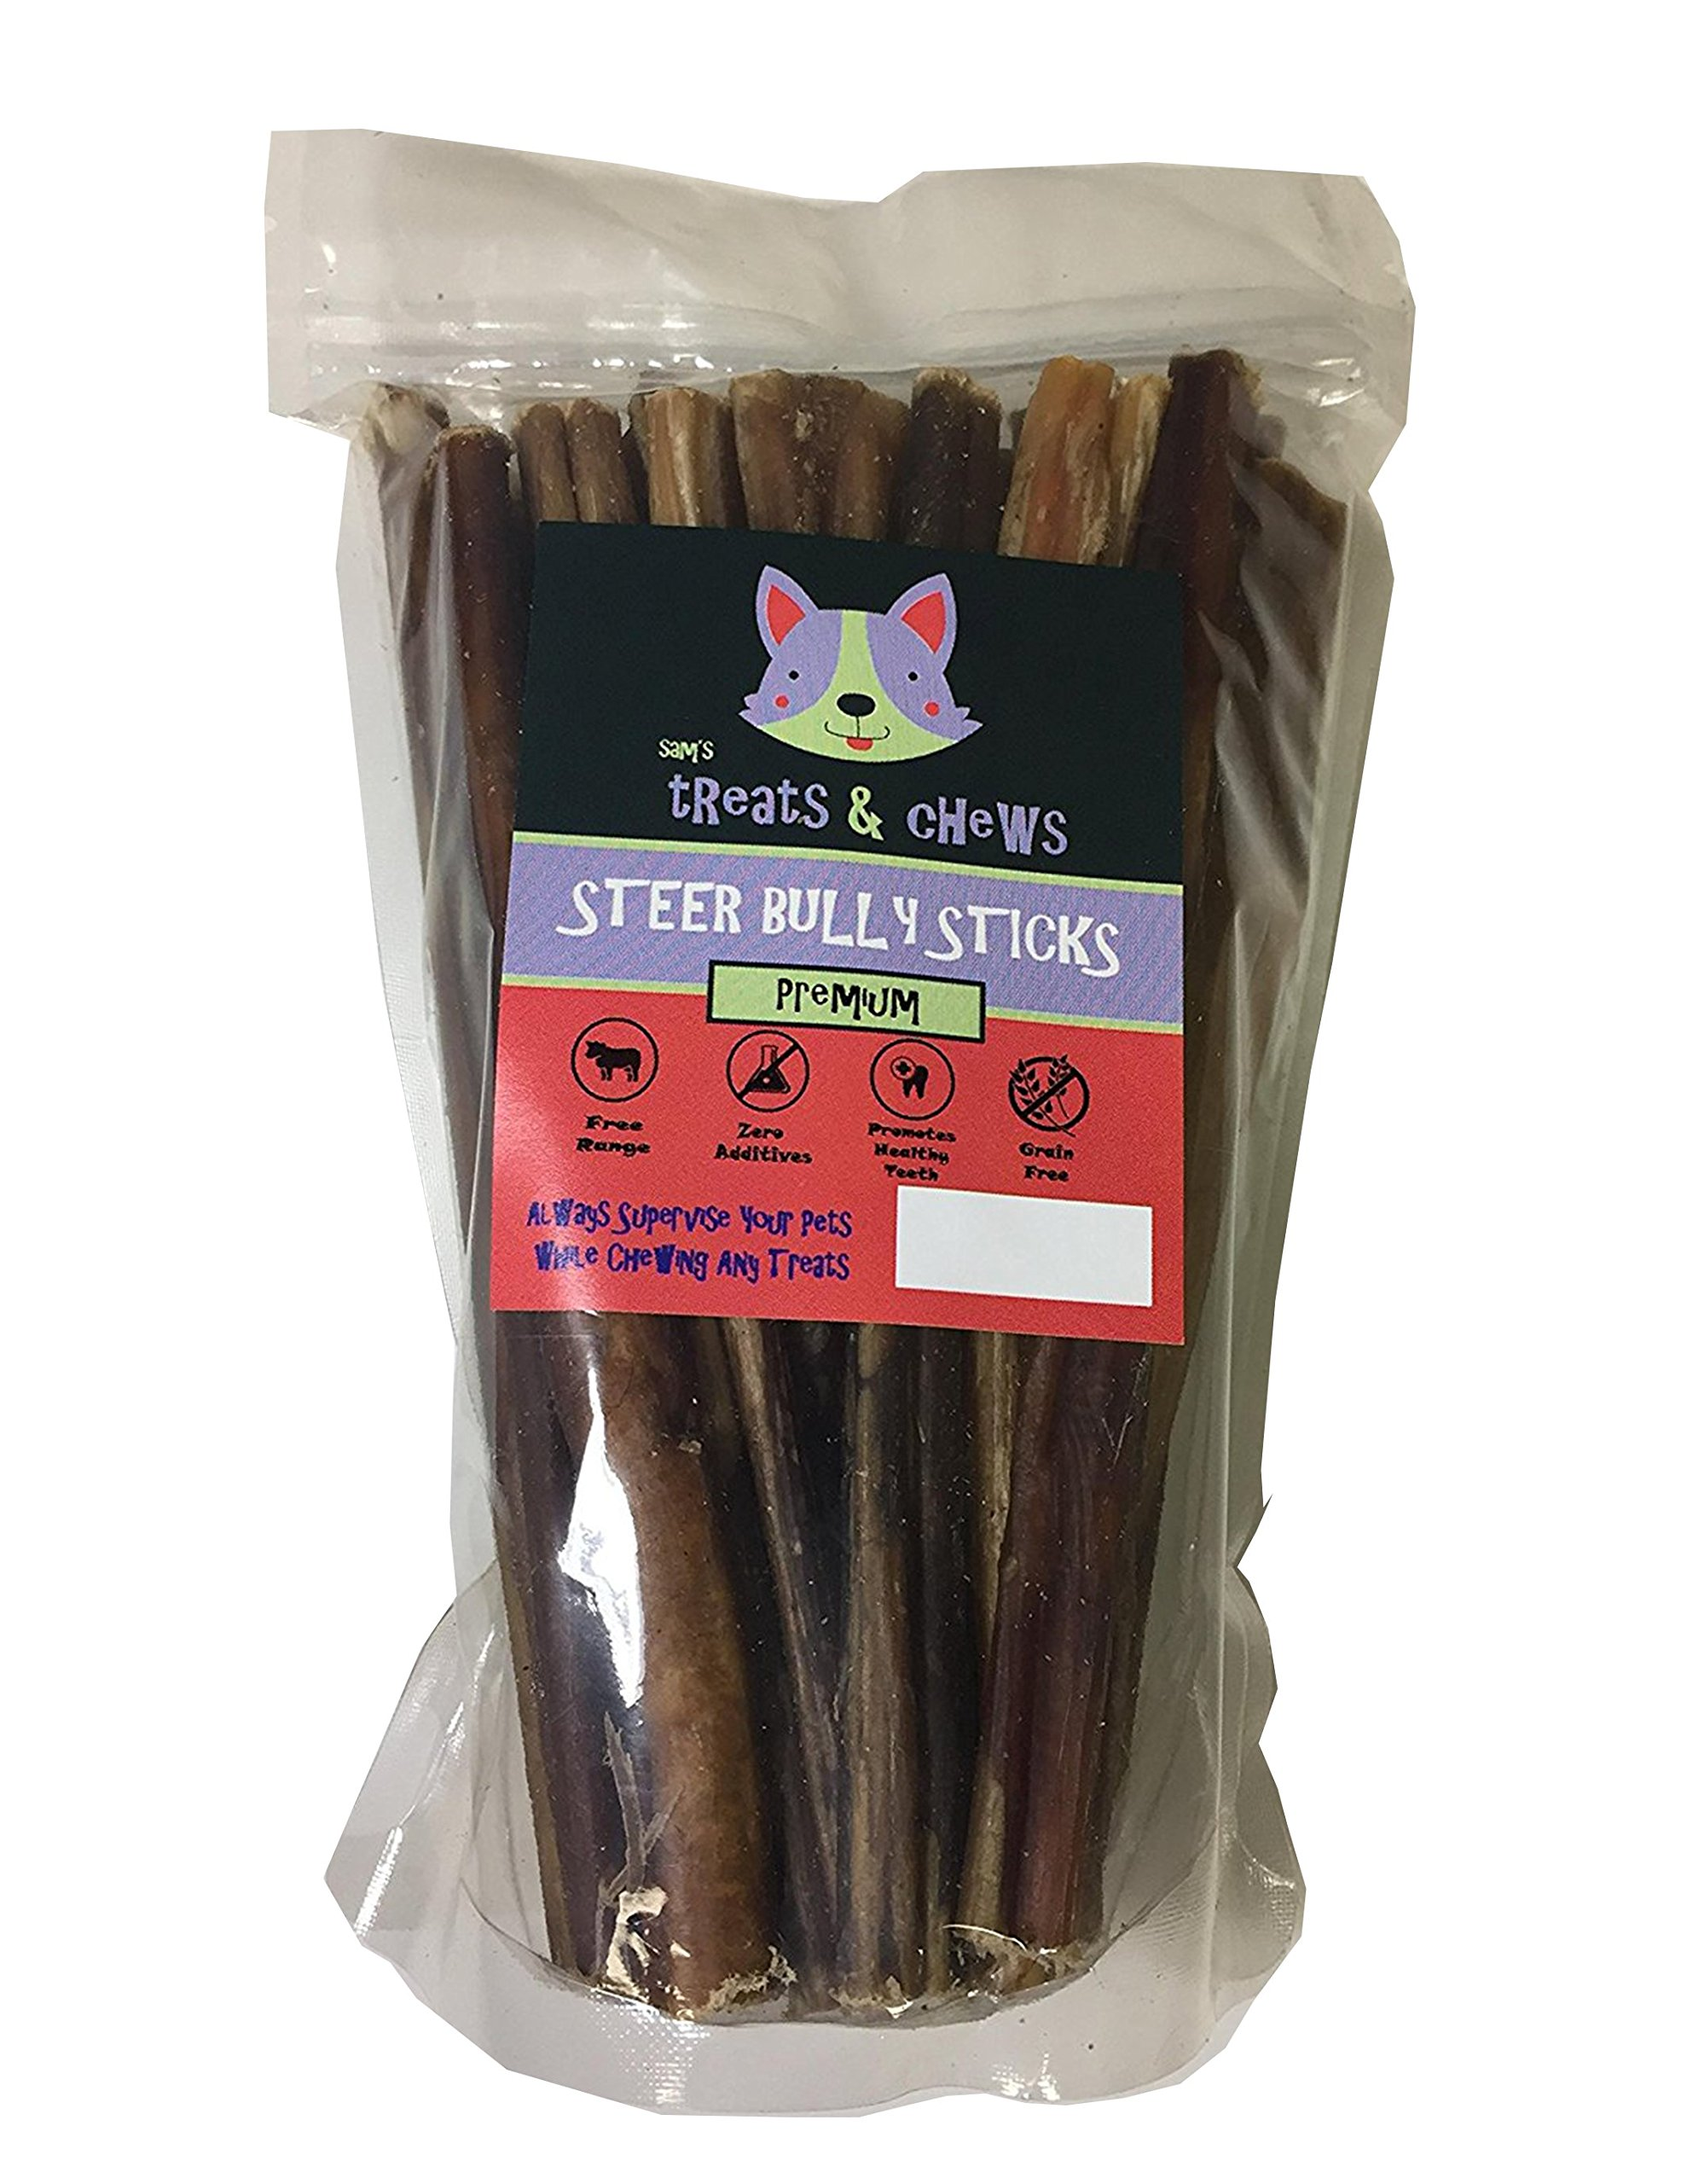 Sam's Treats & Chews 6 inch [ 15 Count ] Thin Junior Bully Sticks, Low Odor, Steer Sticks